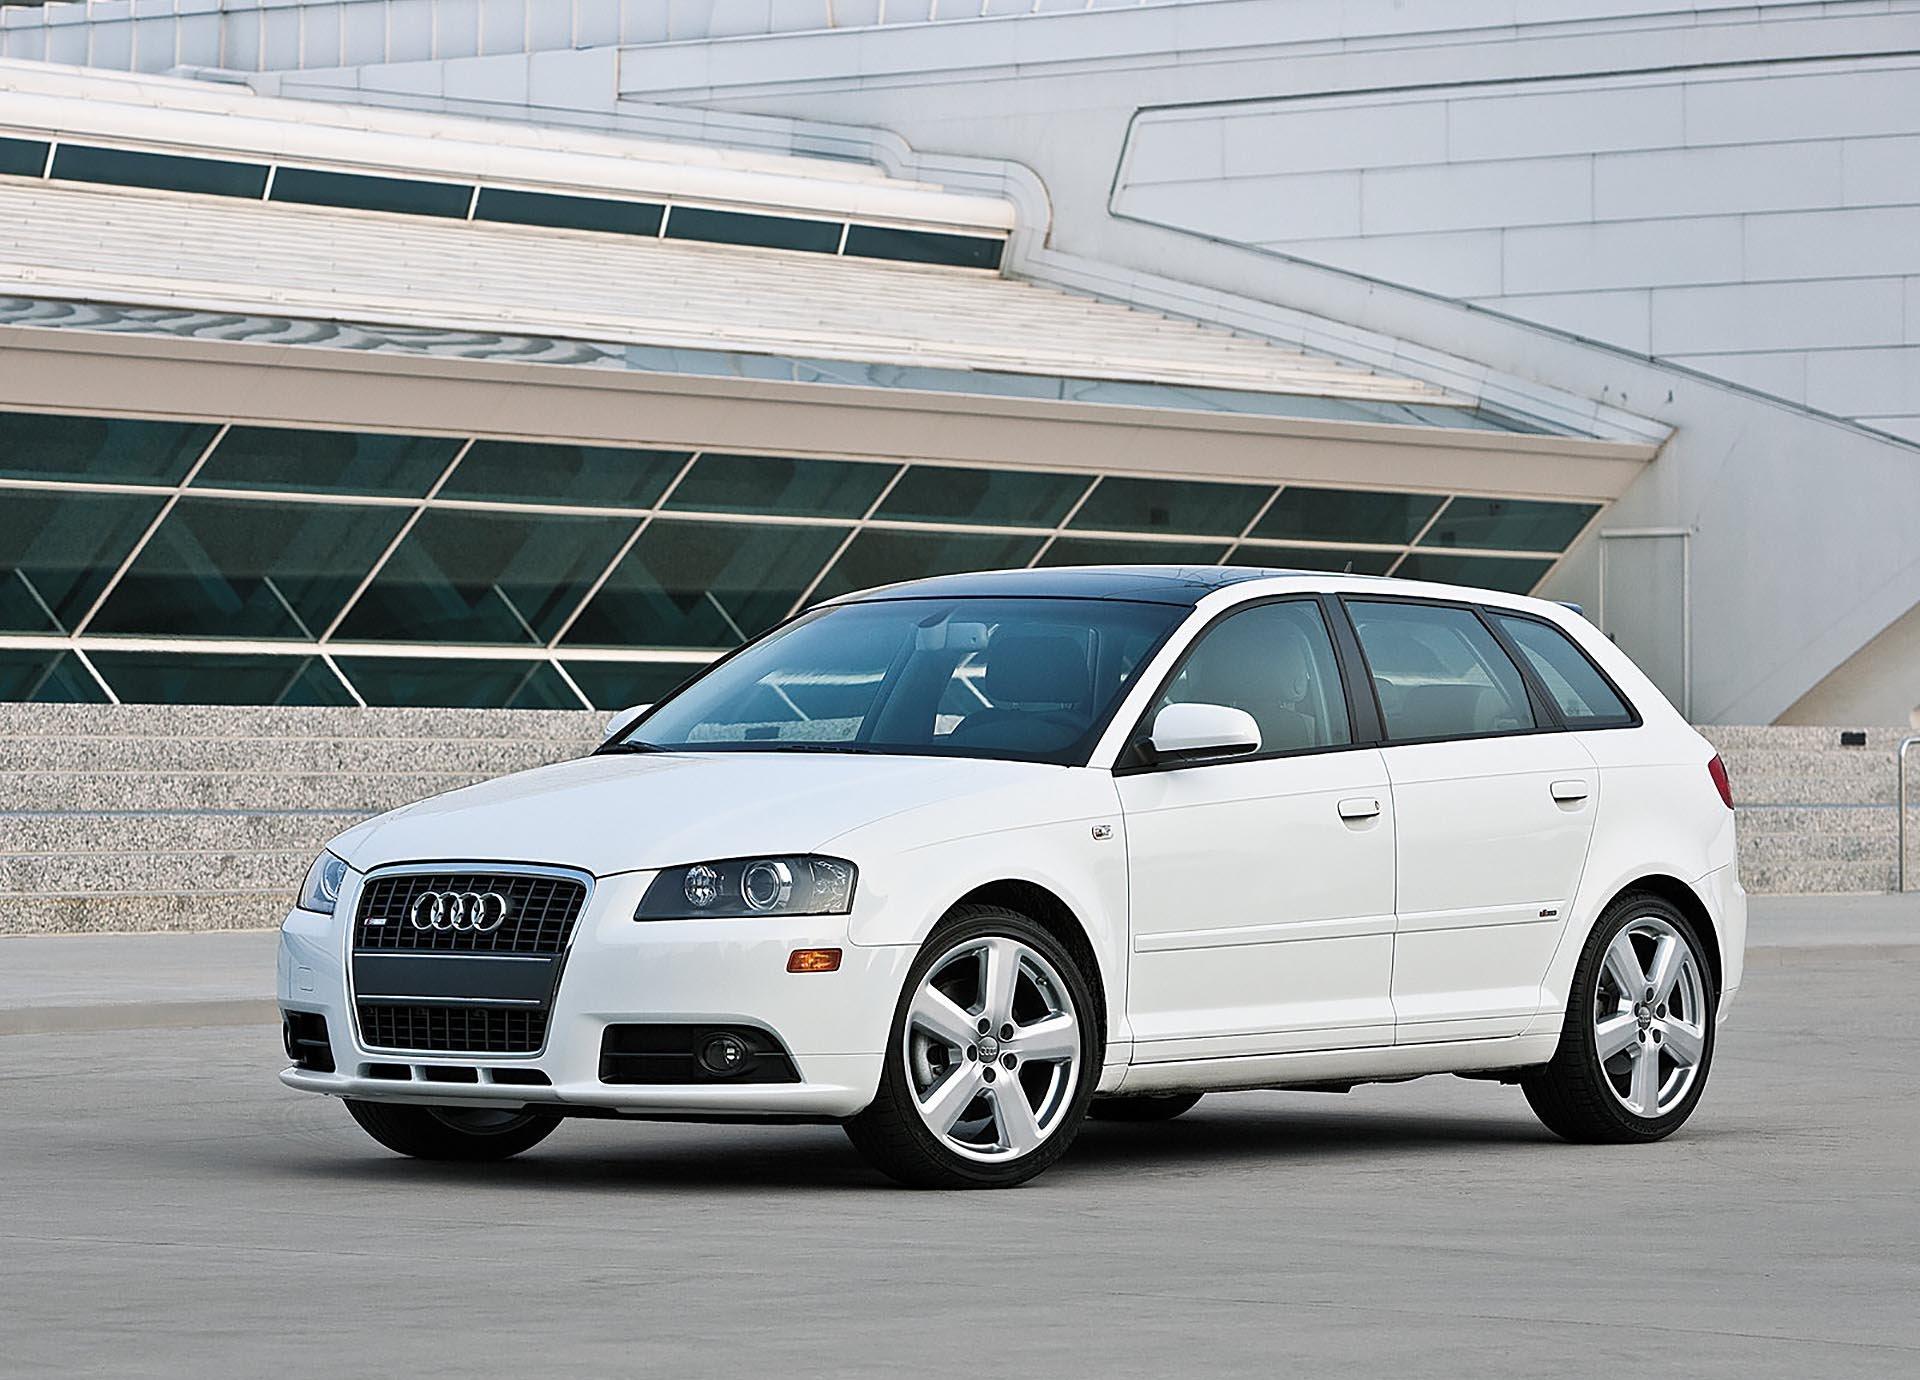 01_Audi A3 8P 3.2 02_Quattro VR6 S Tronic front